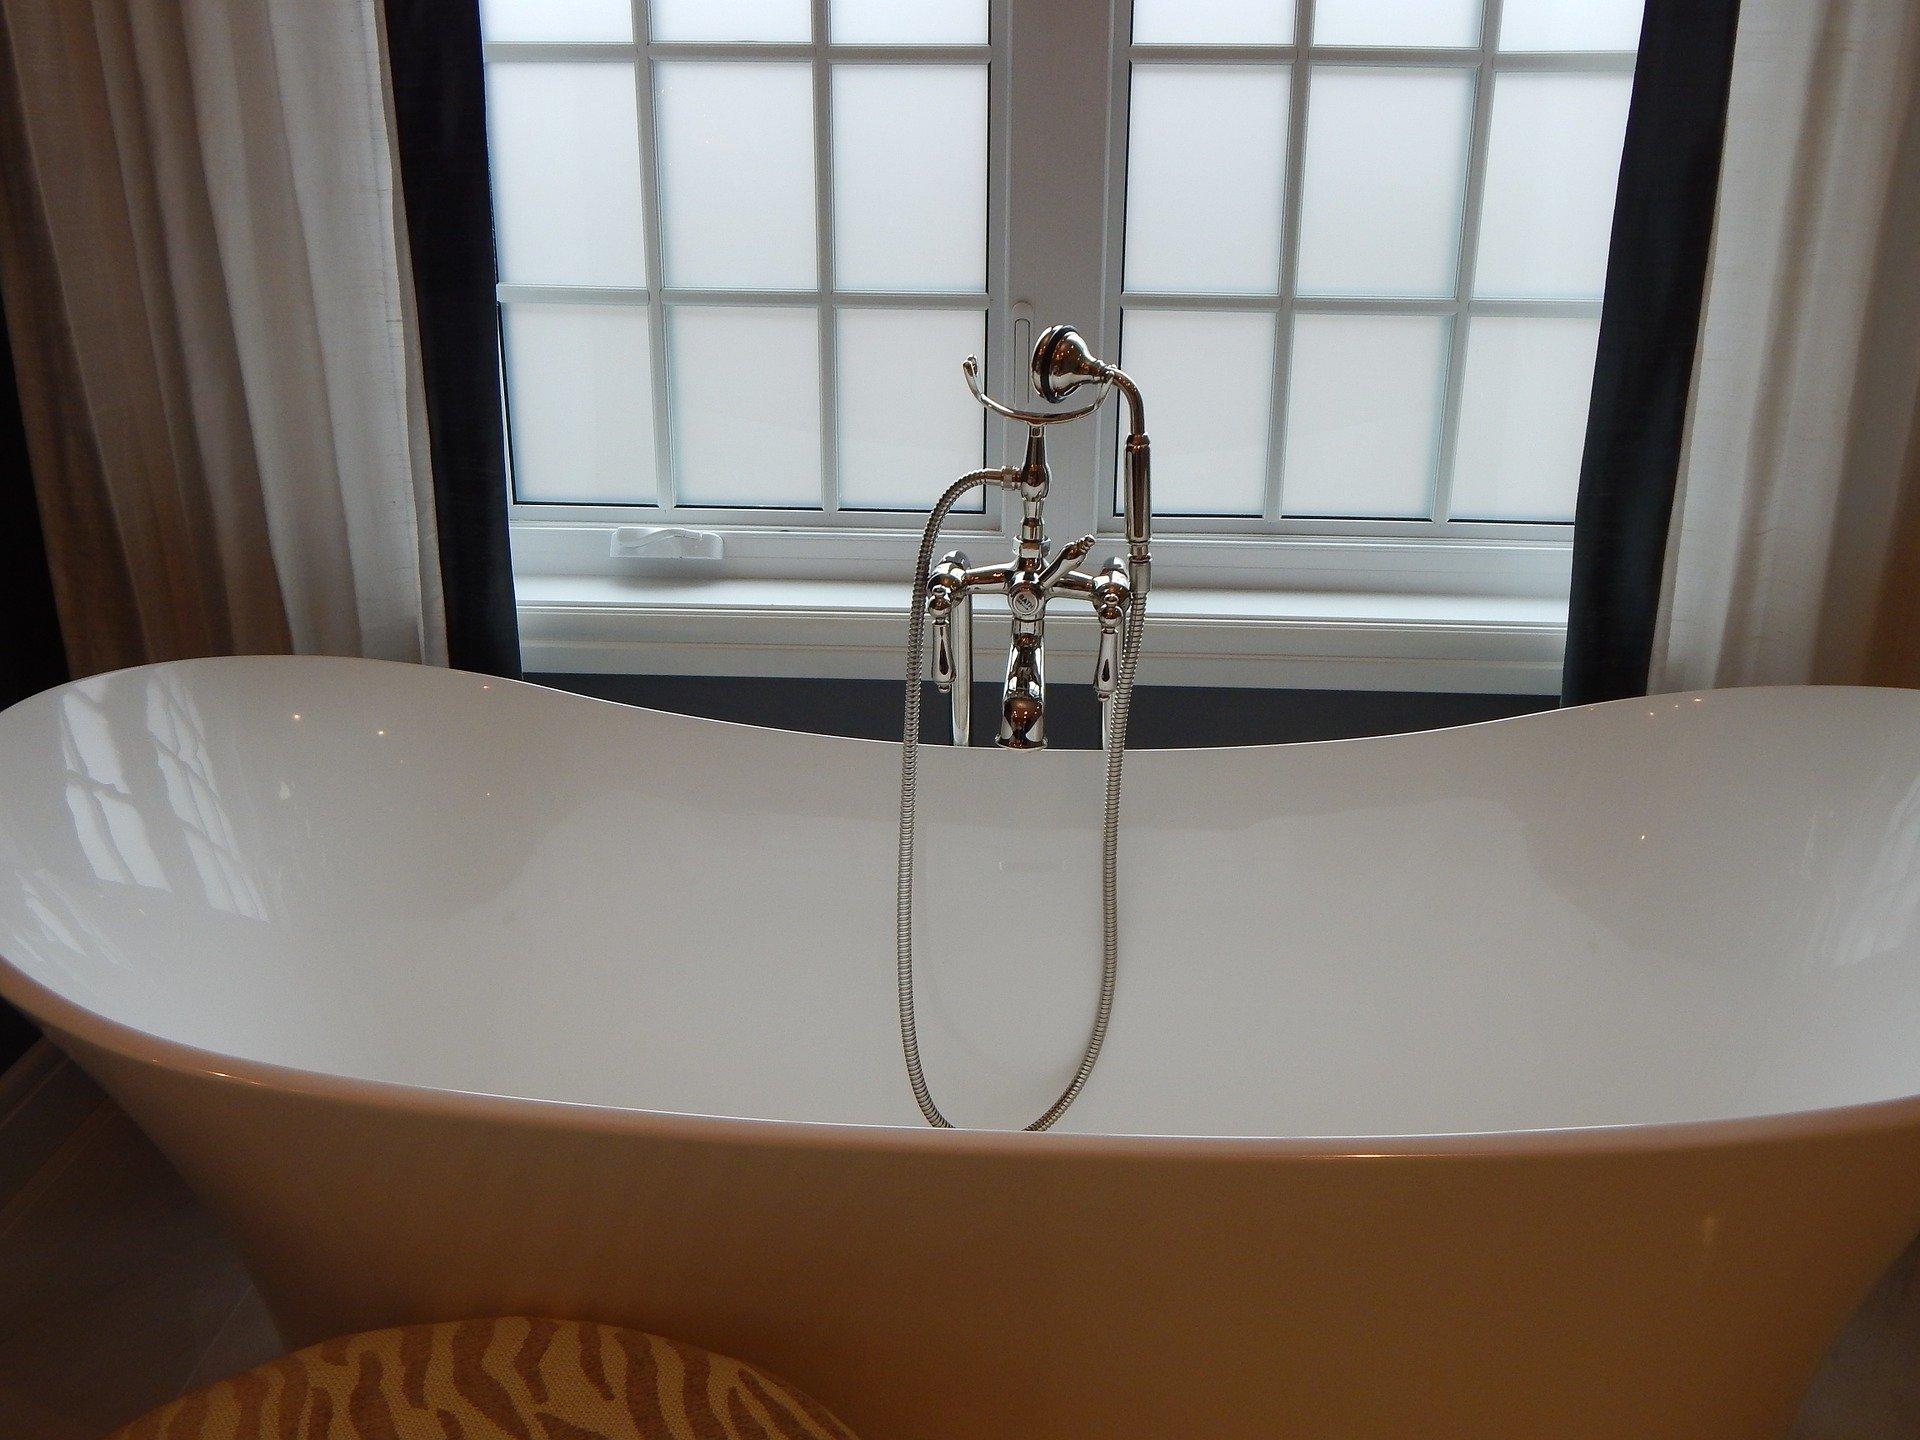 Bathtub. | Source: Erika Wittlieb/Pixabay